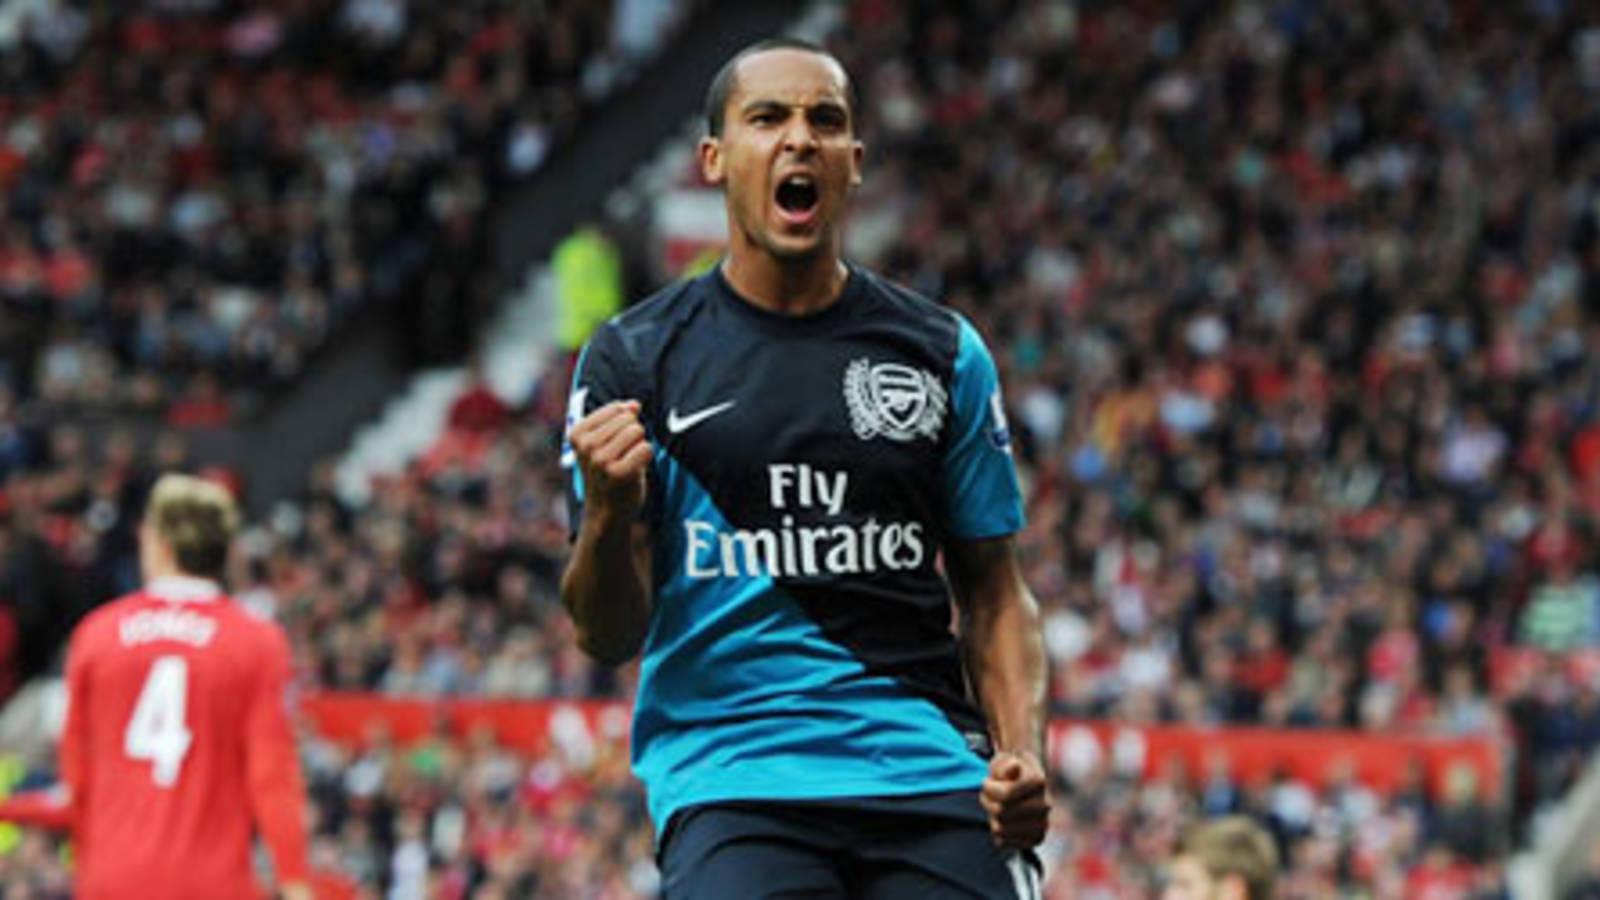 Manchester United 8 2 Arsenal Match Report Arsenal Com